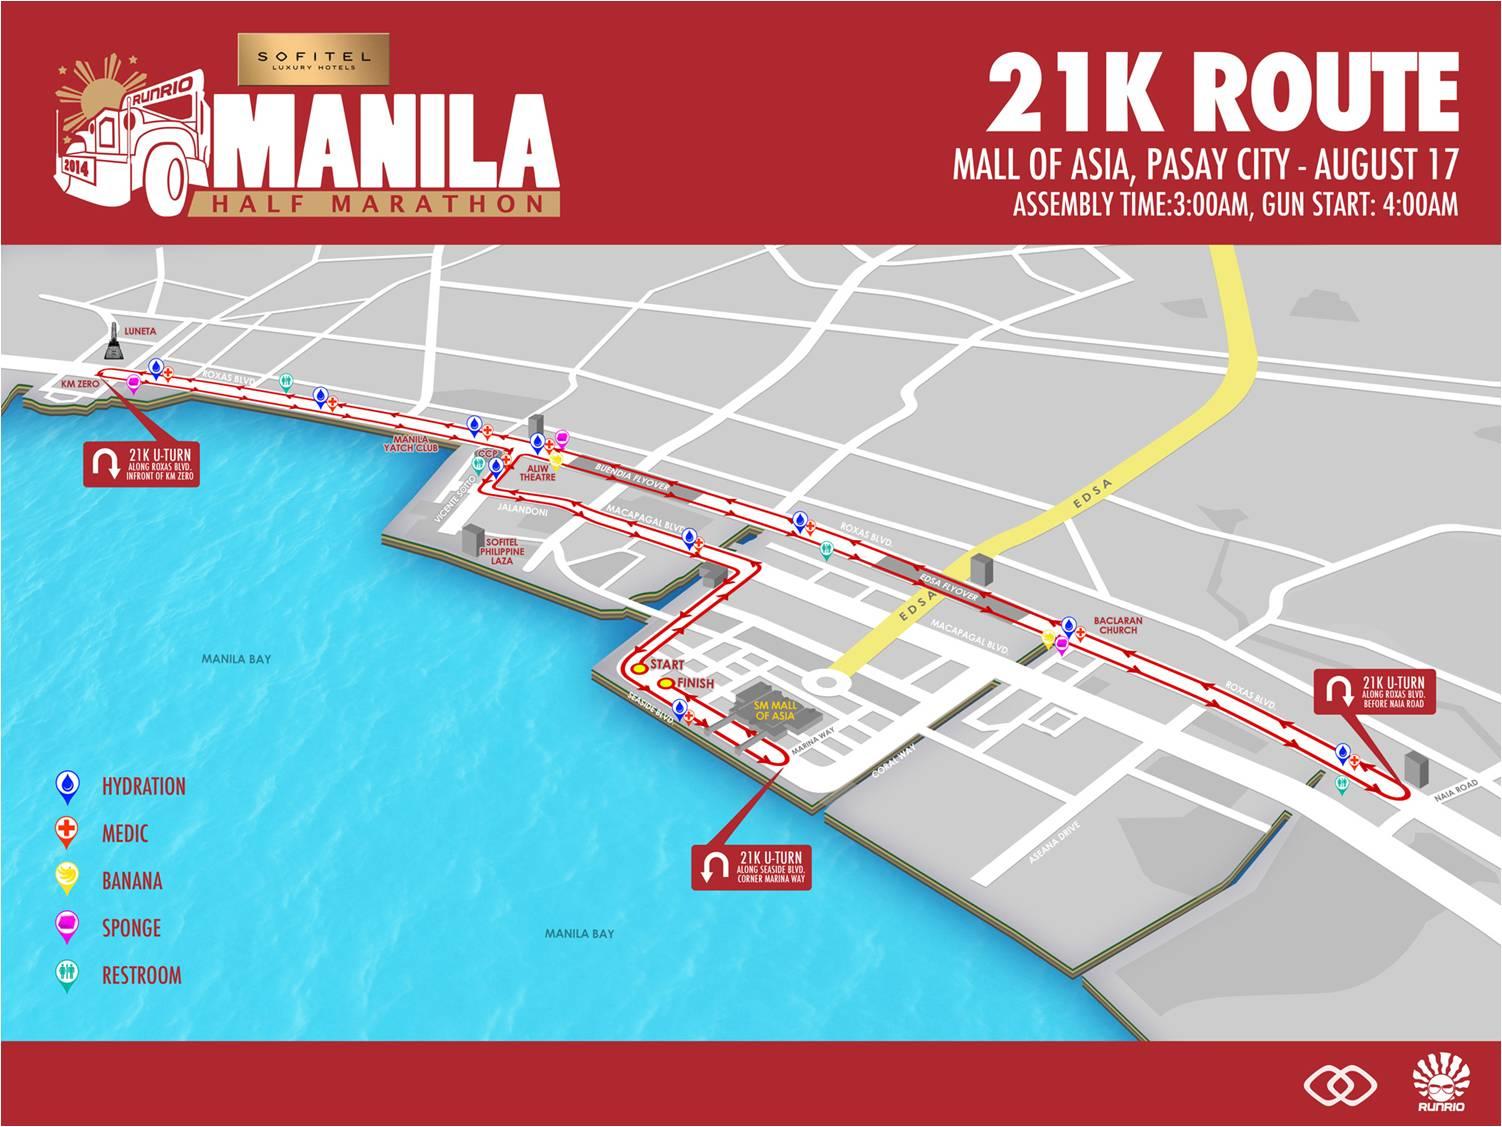 Sofitel Manila Half Marathon 21k route